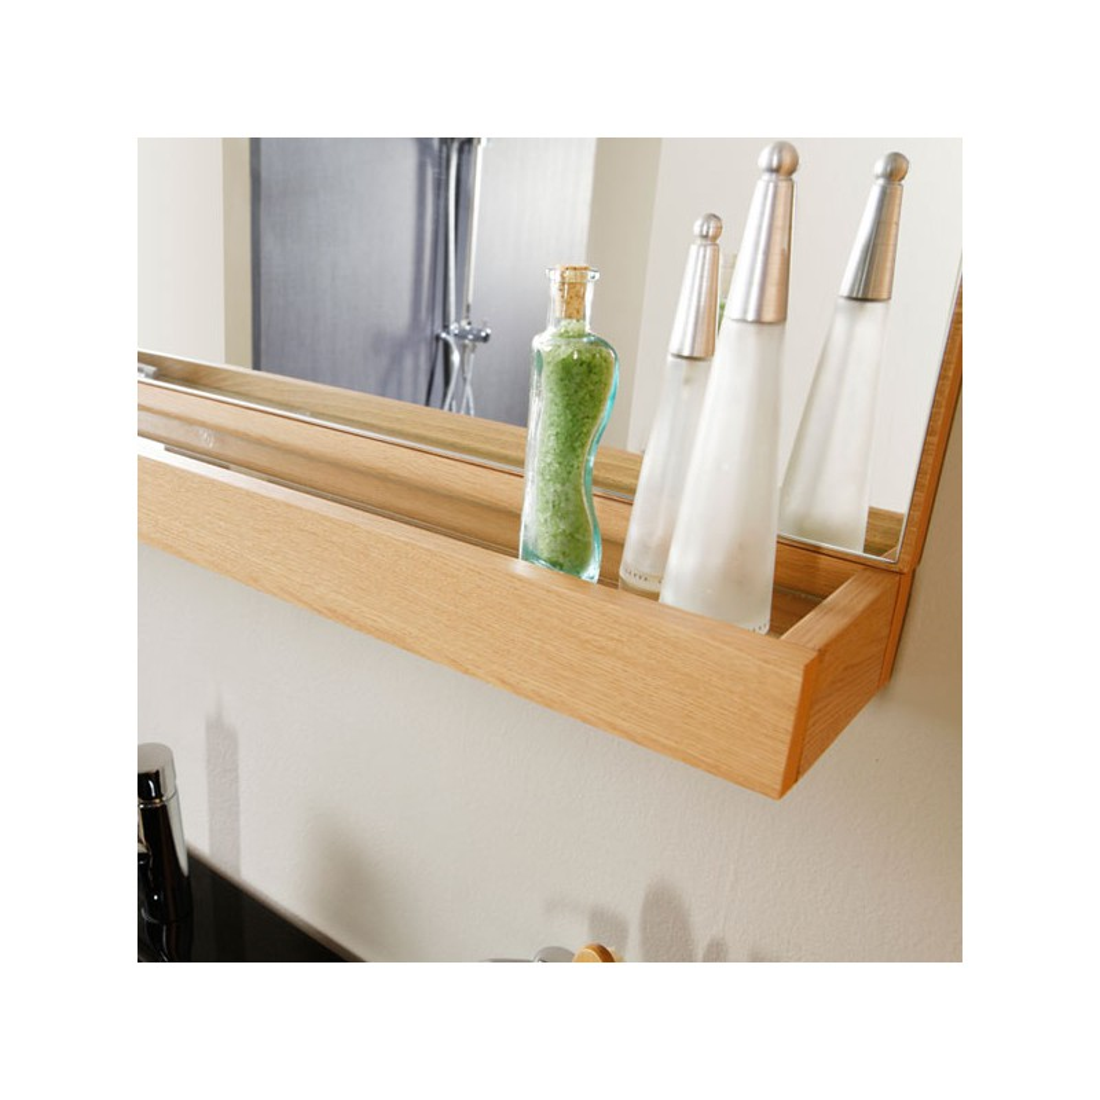 Colonne salle de bain chene clair trendy meuble salle de bain d motion l cm with colonne salle for Meuble salle de bain calao